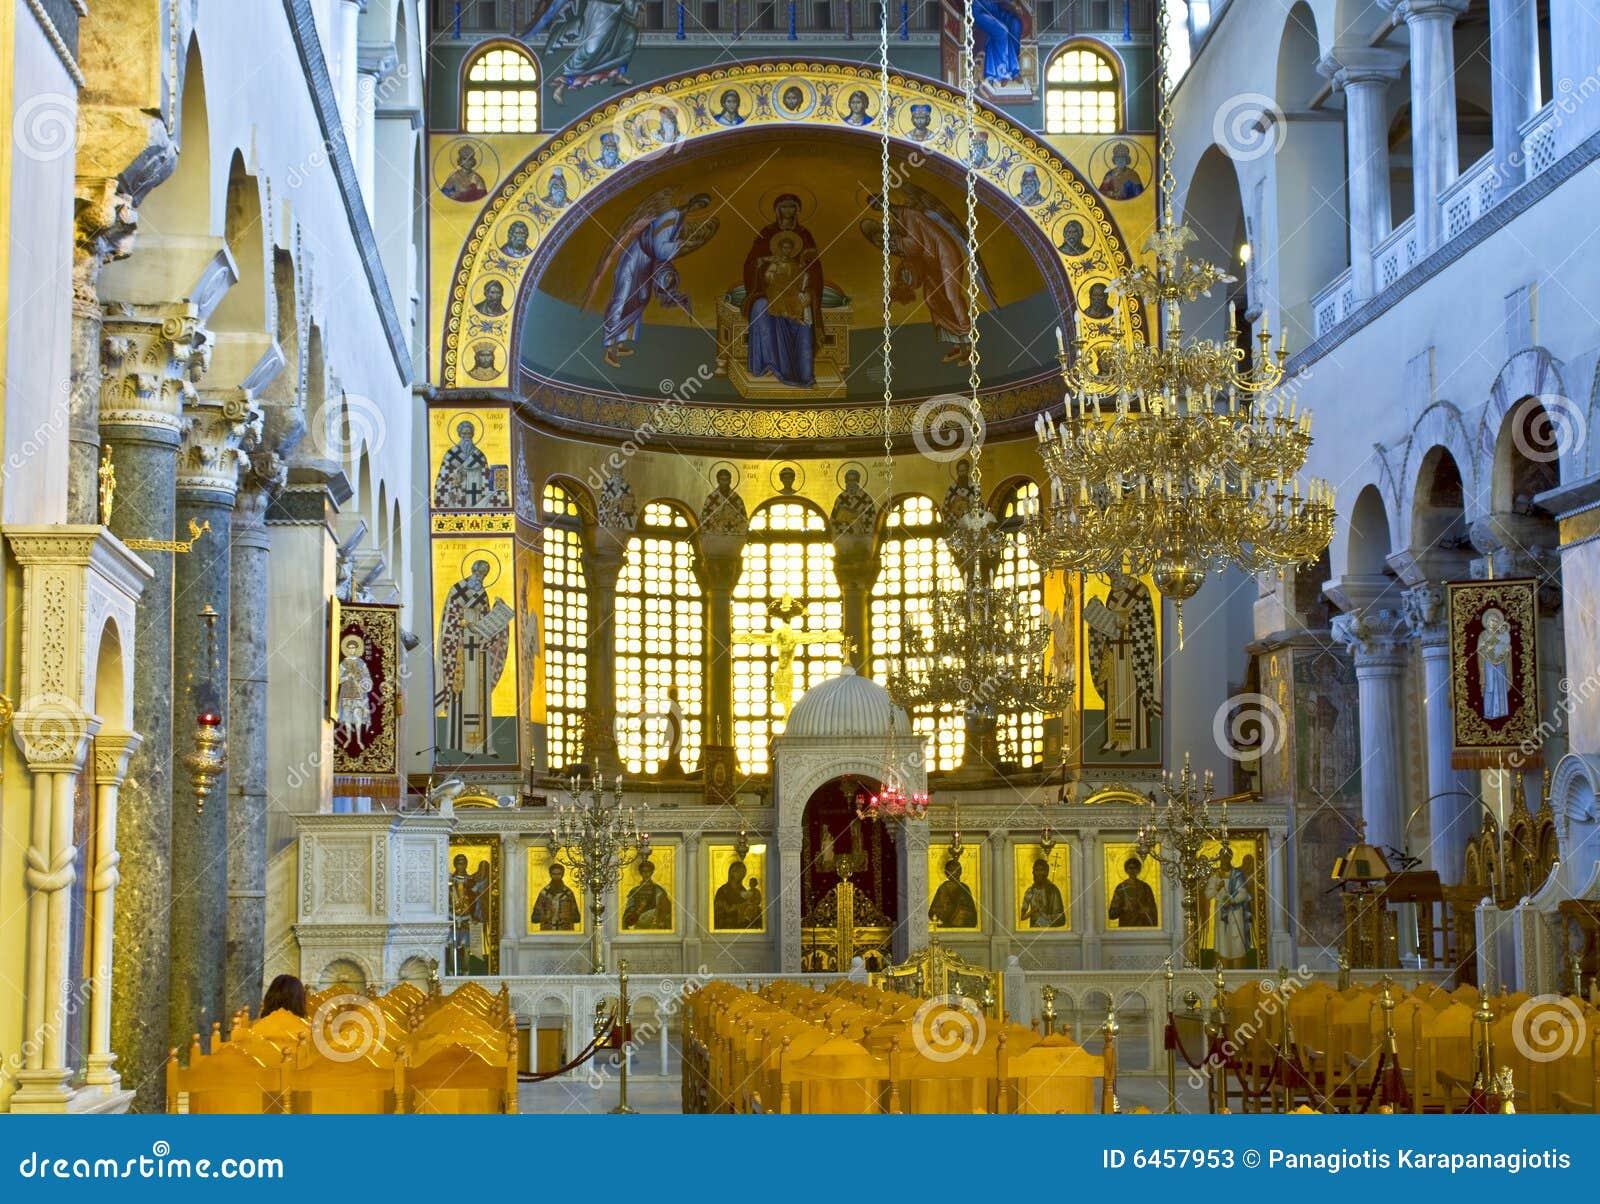 Greek orthodox church interior